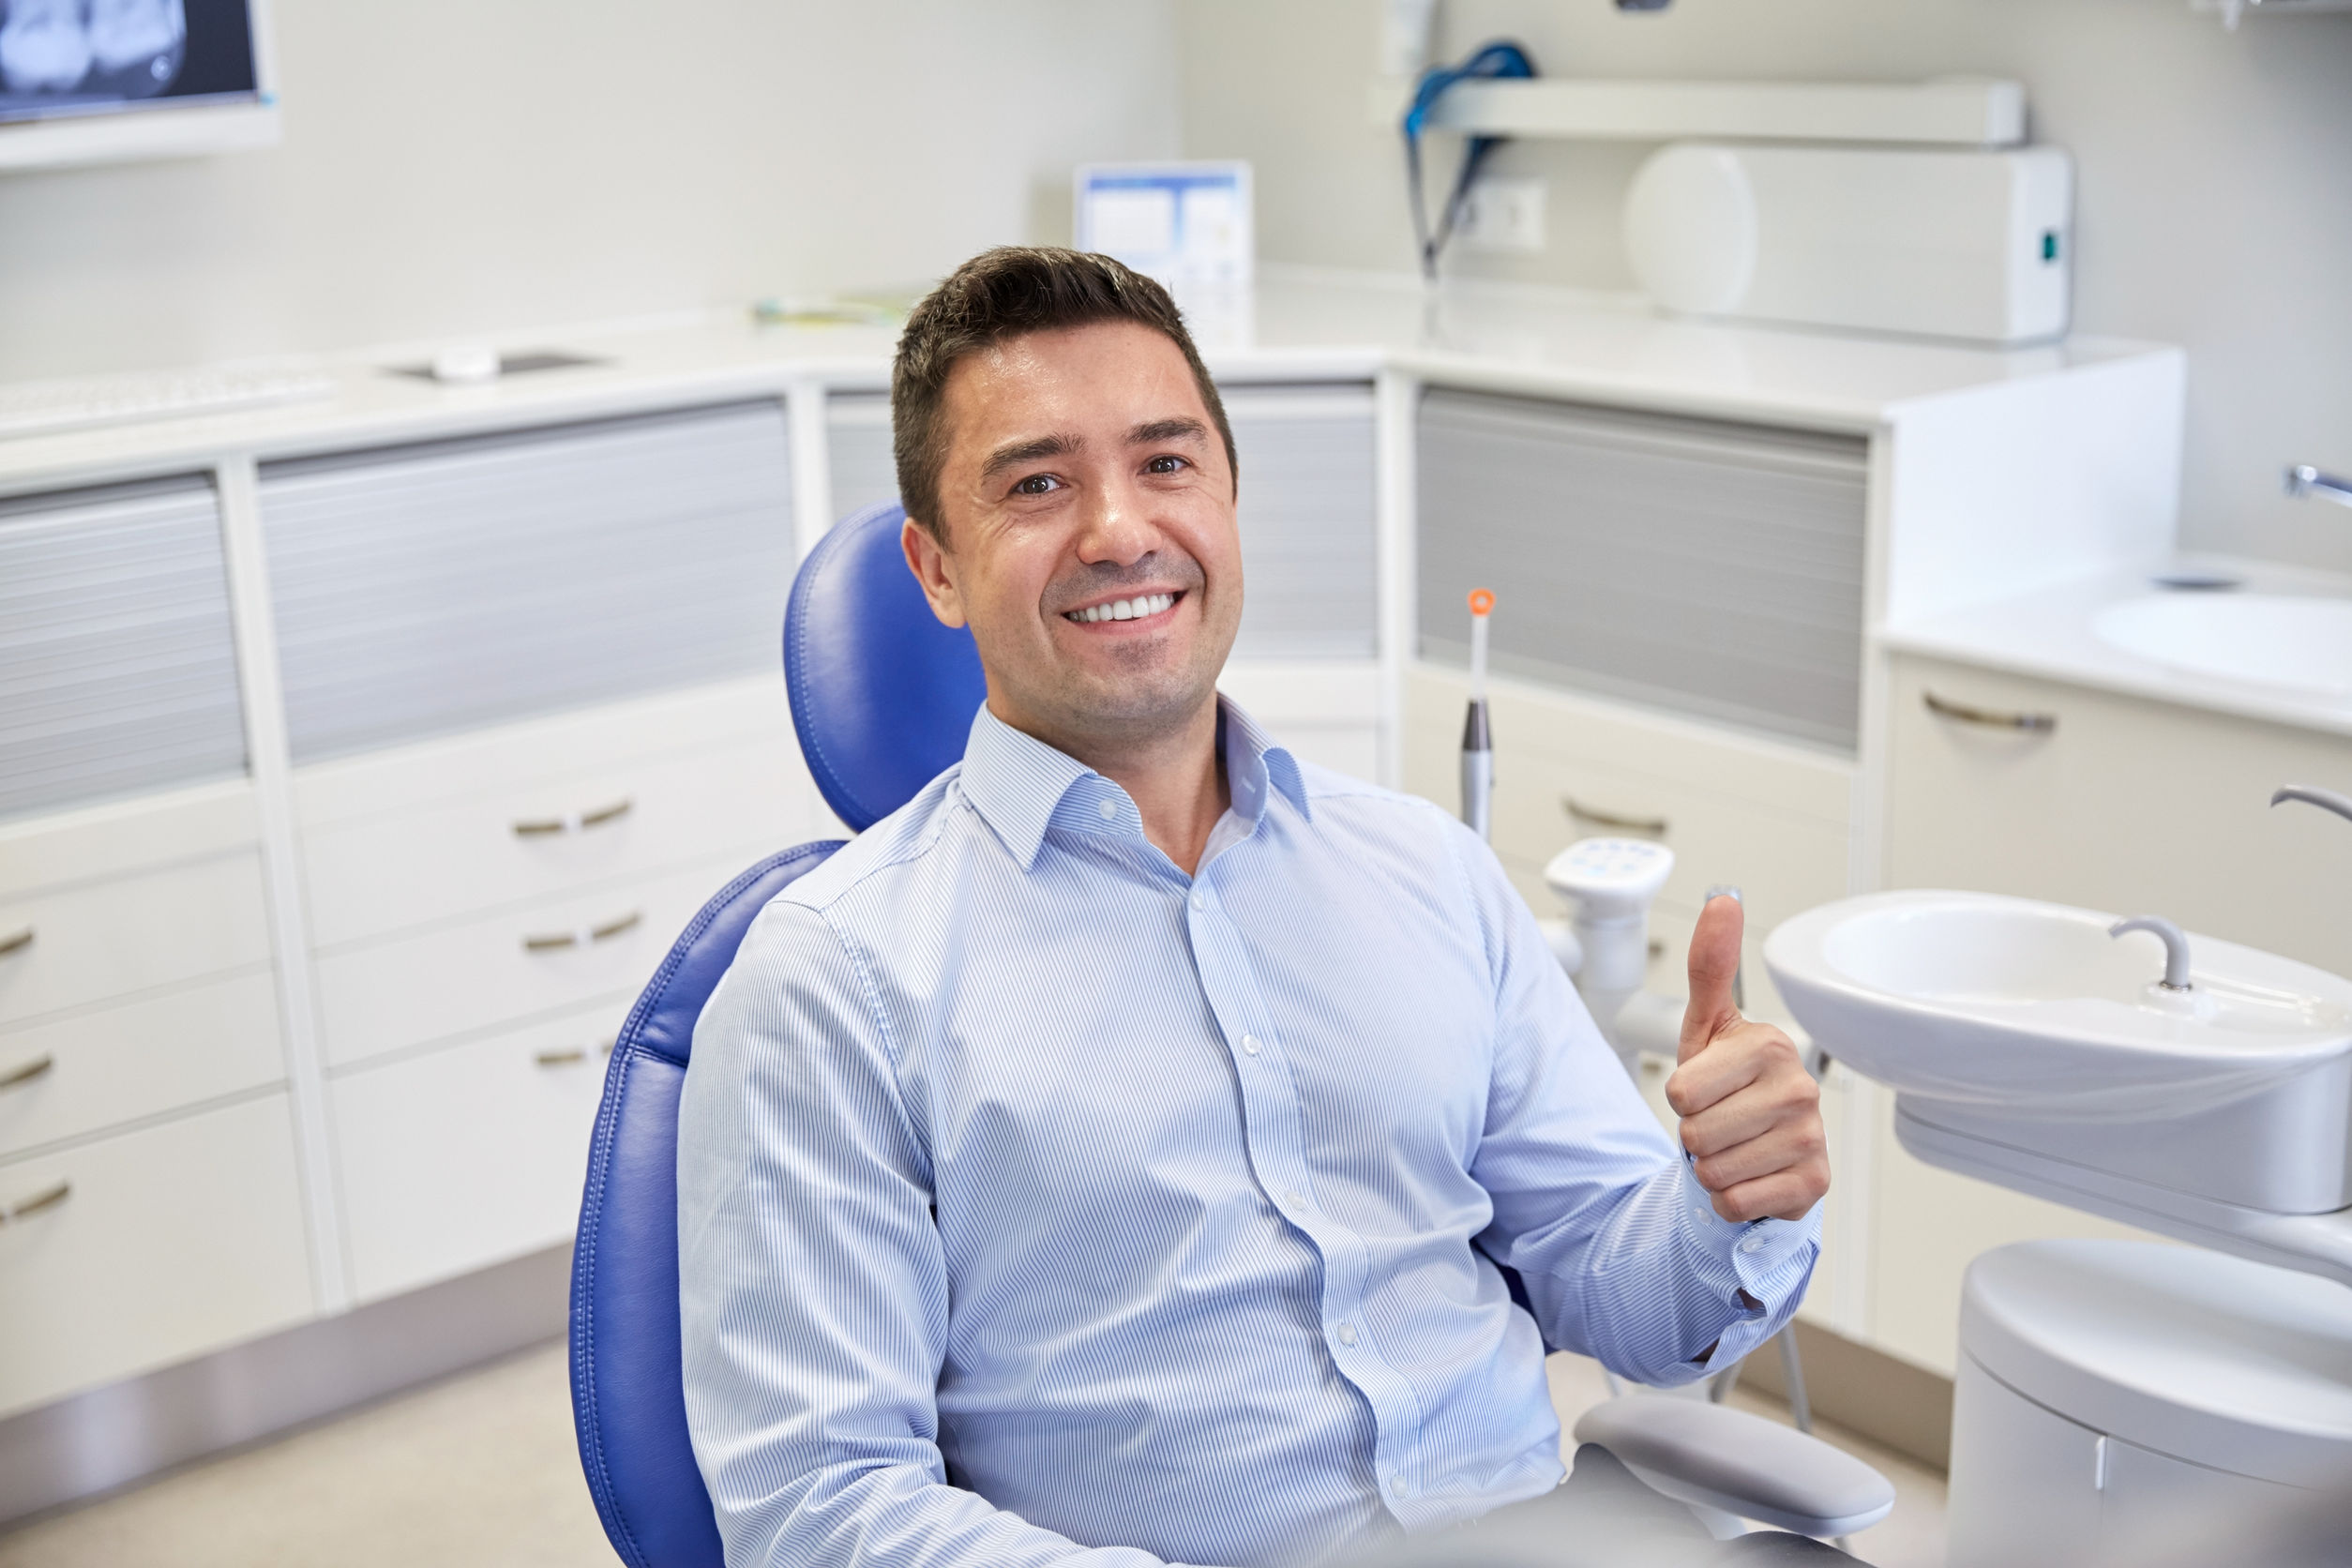 Plainview Sedation Dentistry